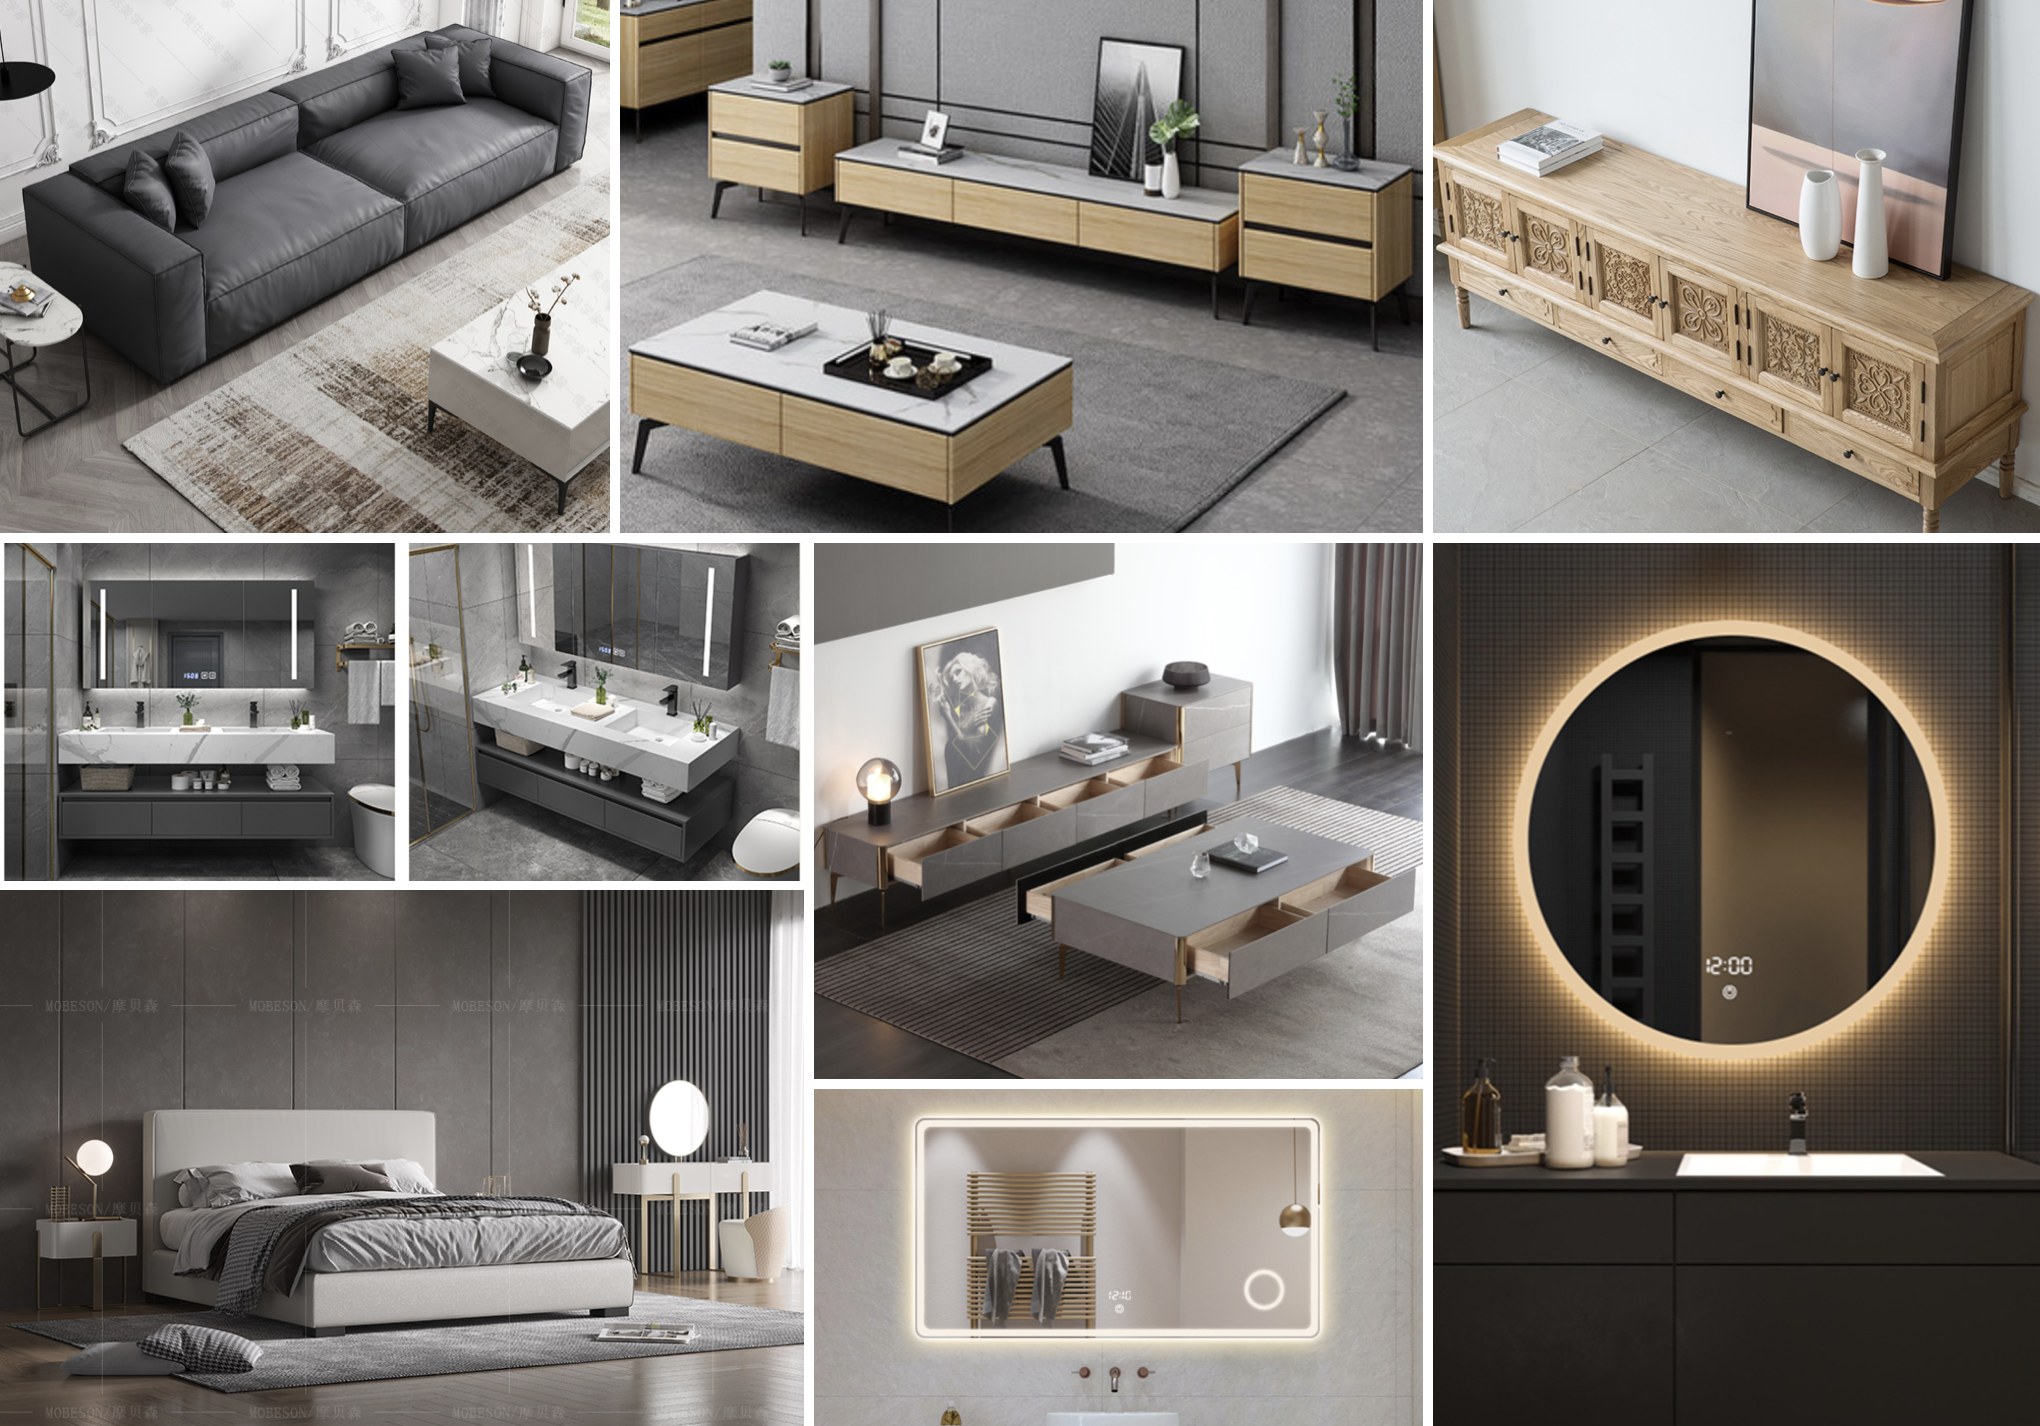 Furniture materials